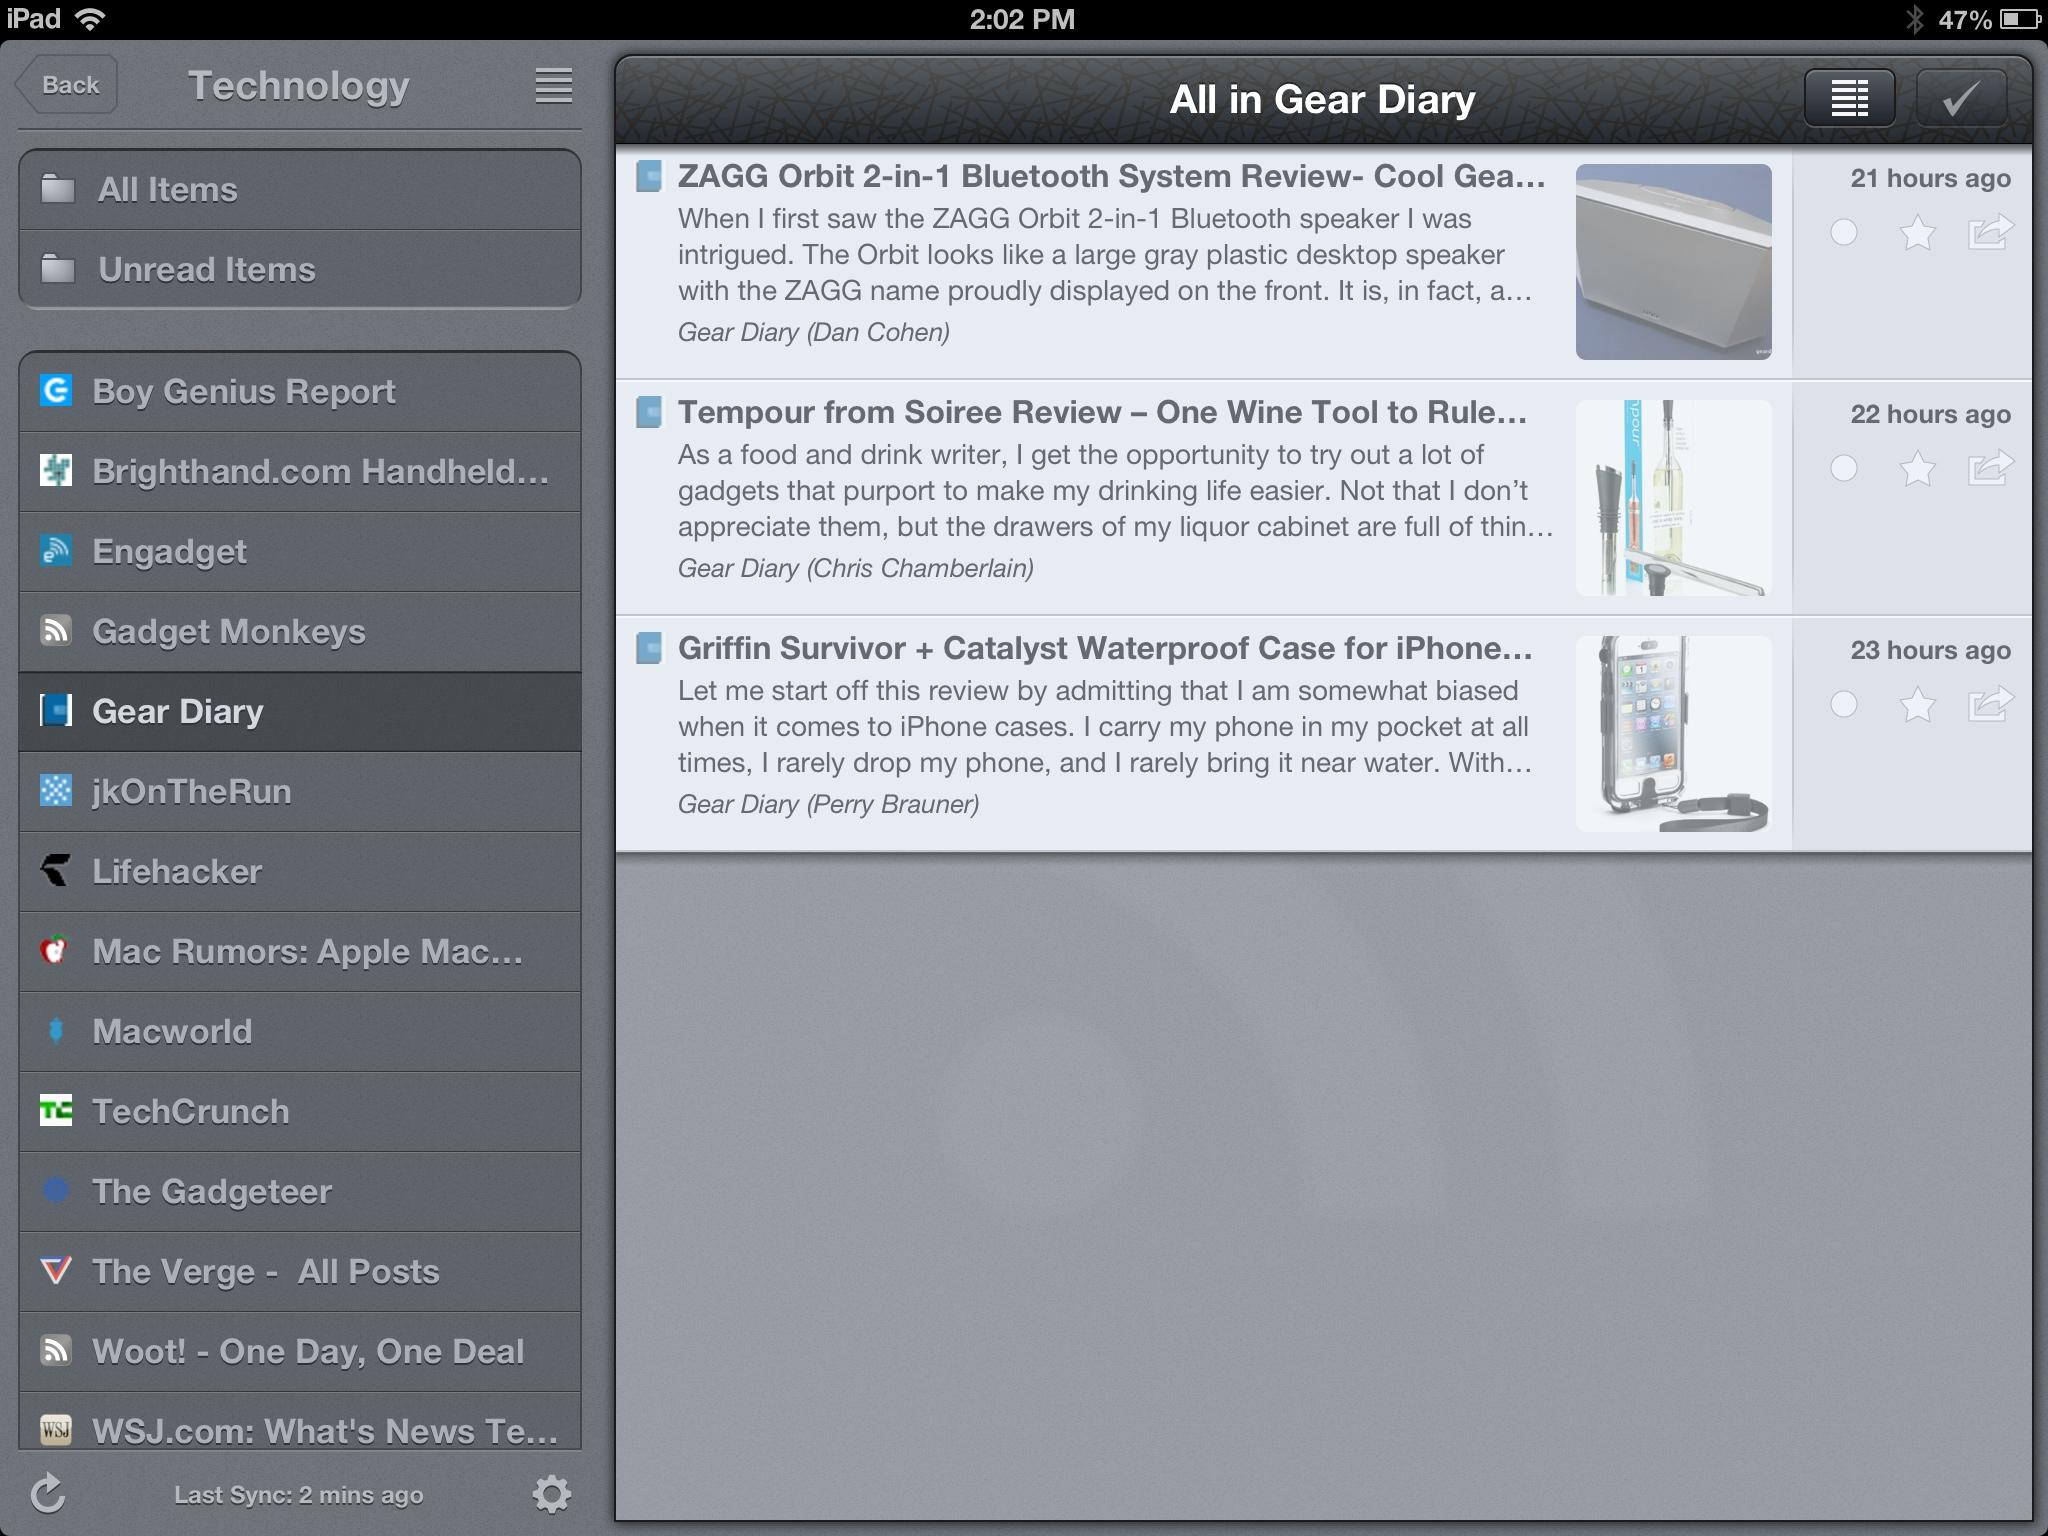 iPad Apps   iPad Apps   iPad Apps   iPad Apps